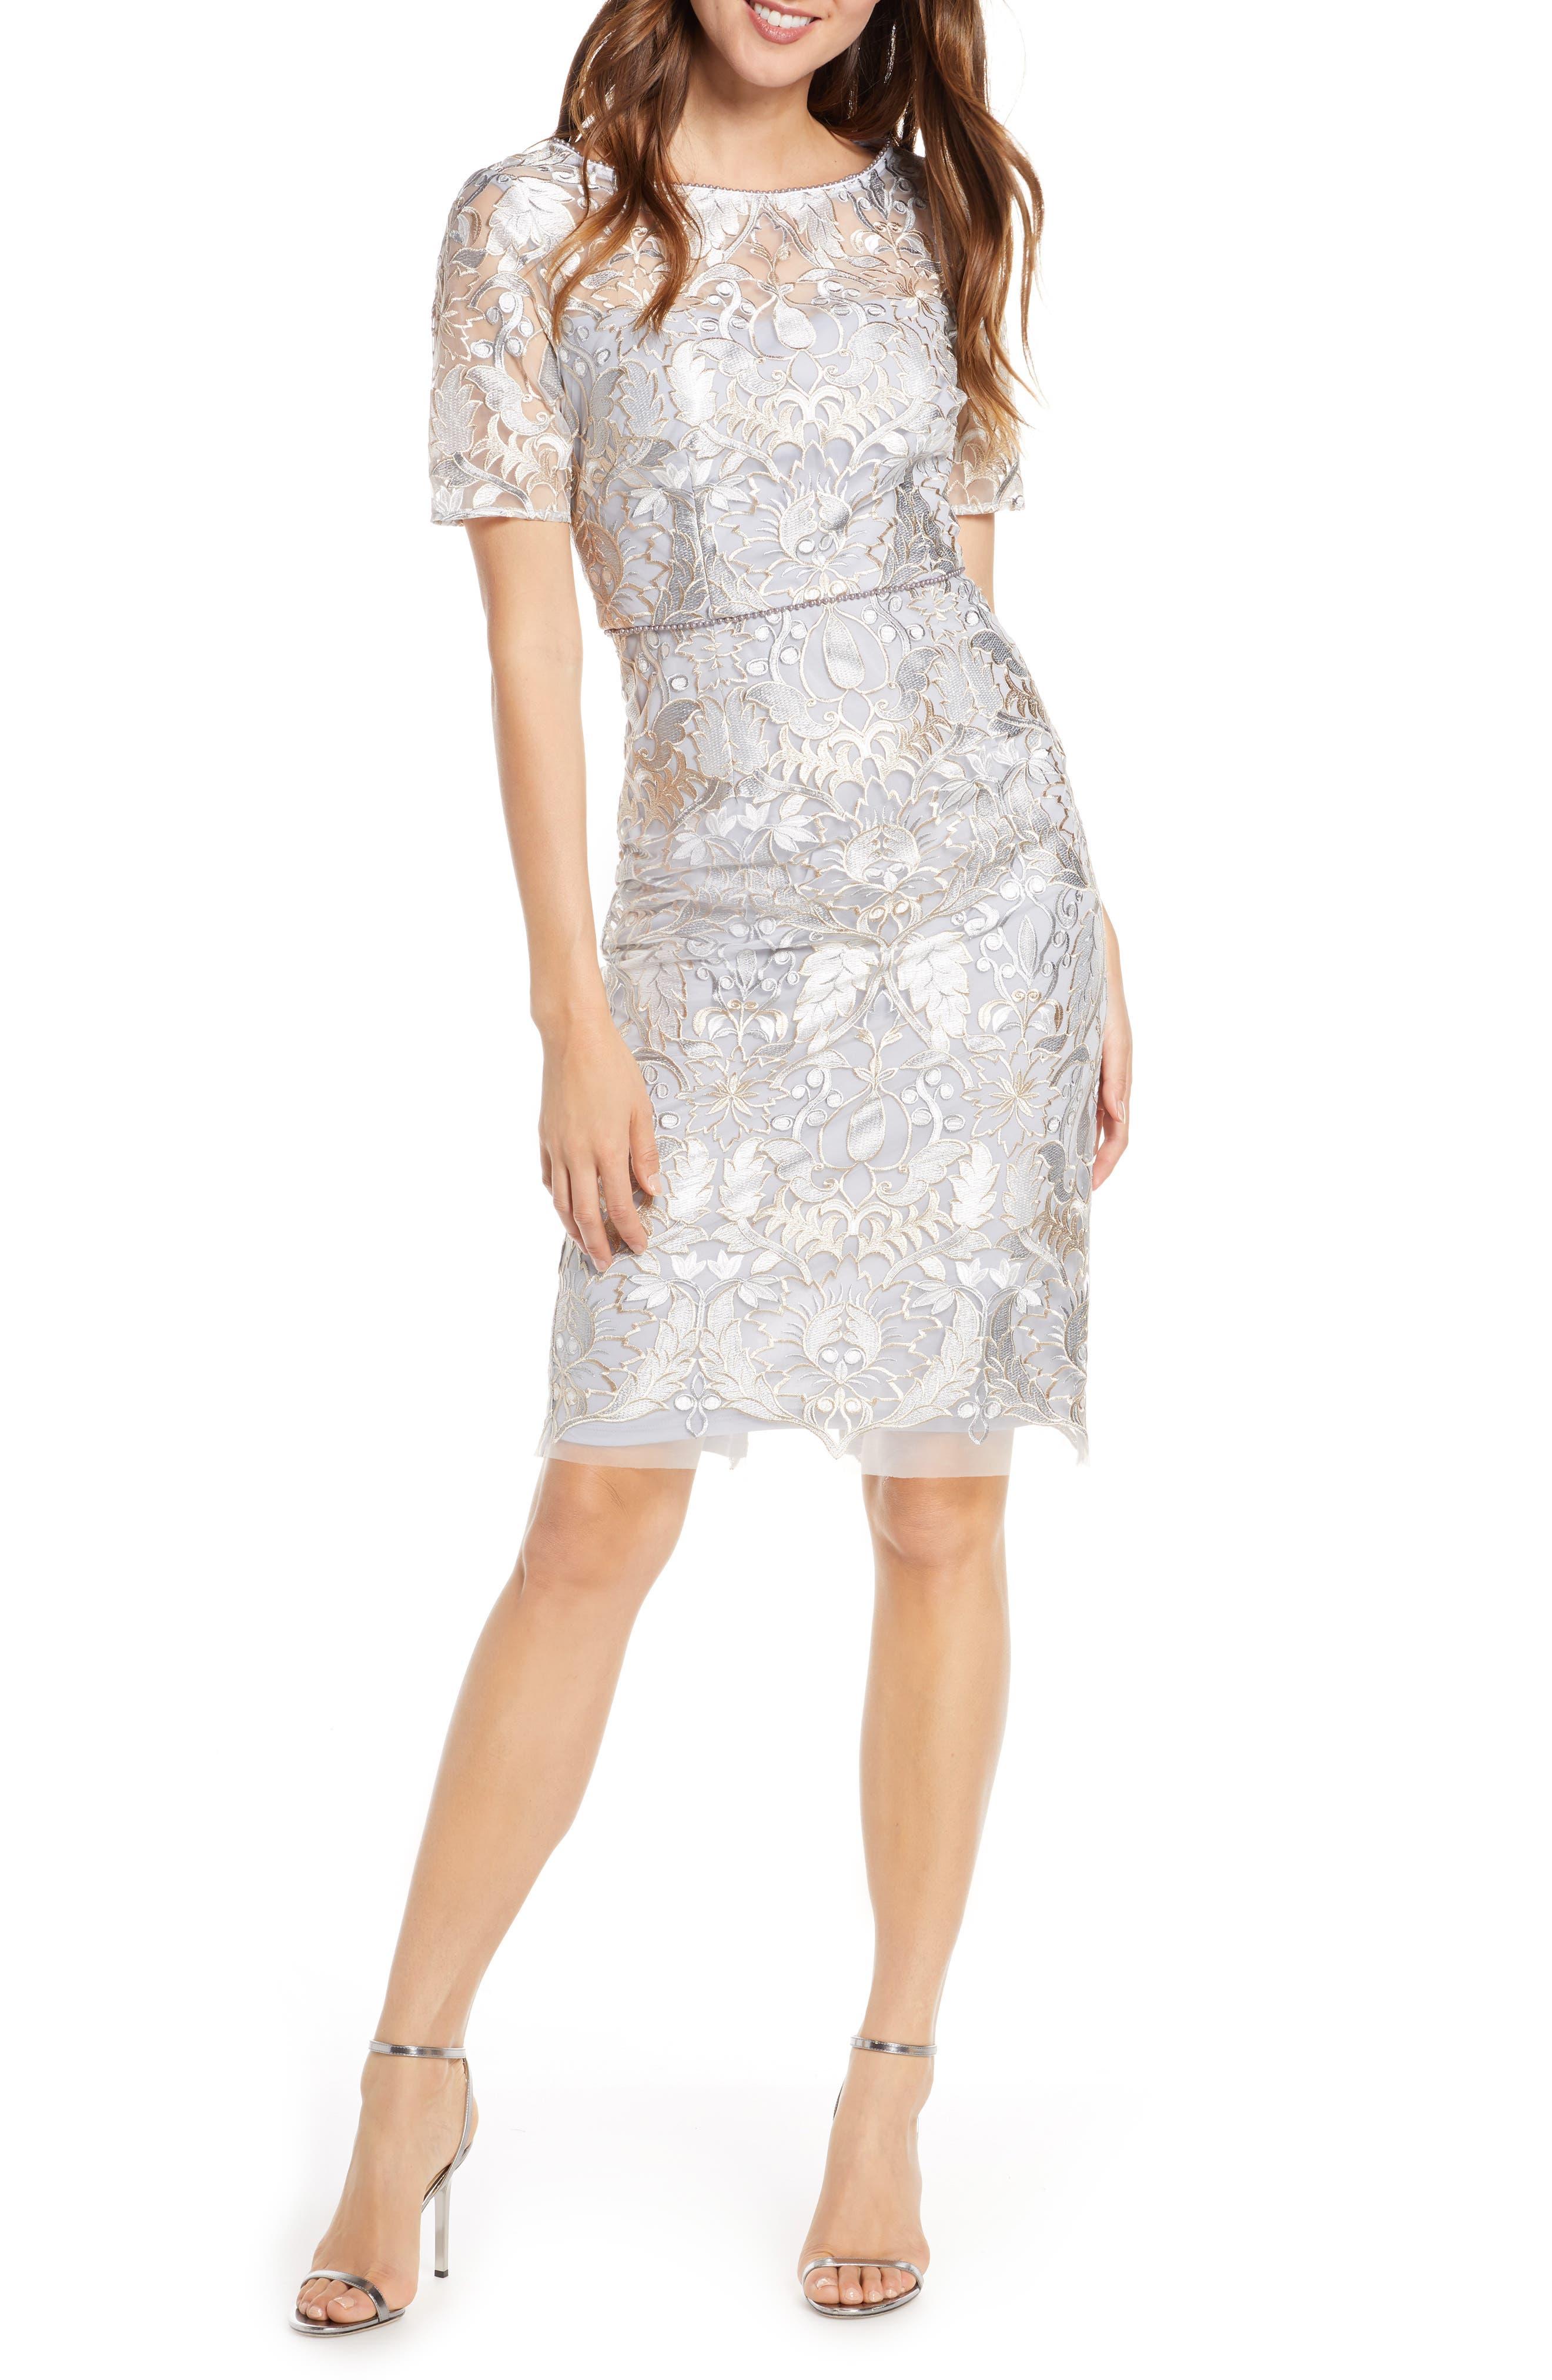 c6c304cd621bce Adrianna Papell Beaded Lace Cocktail Dress, Metallic